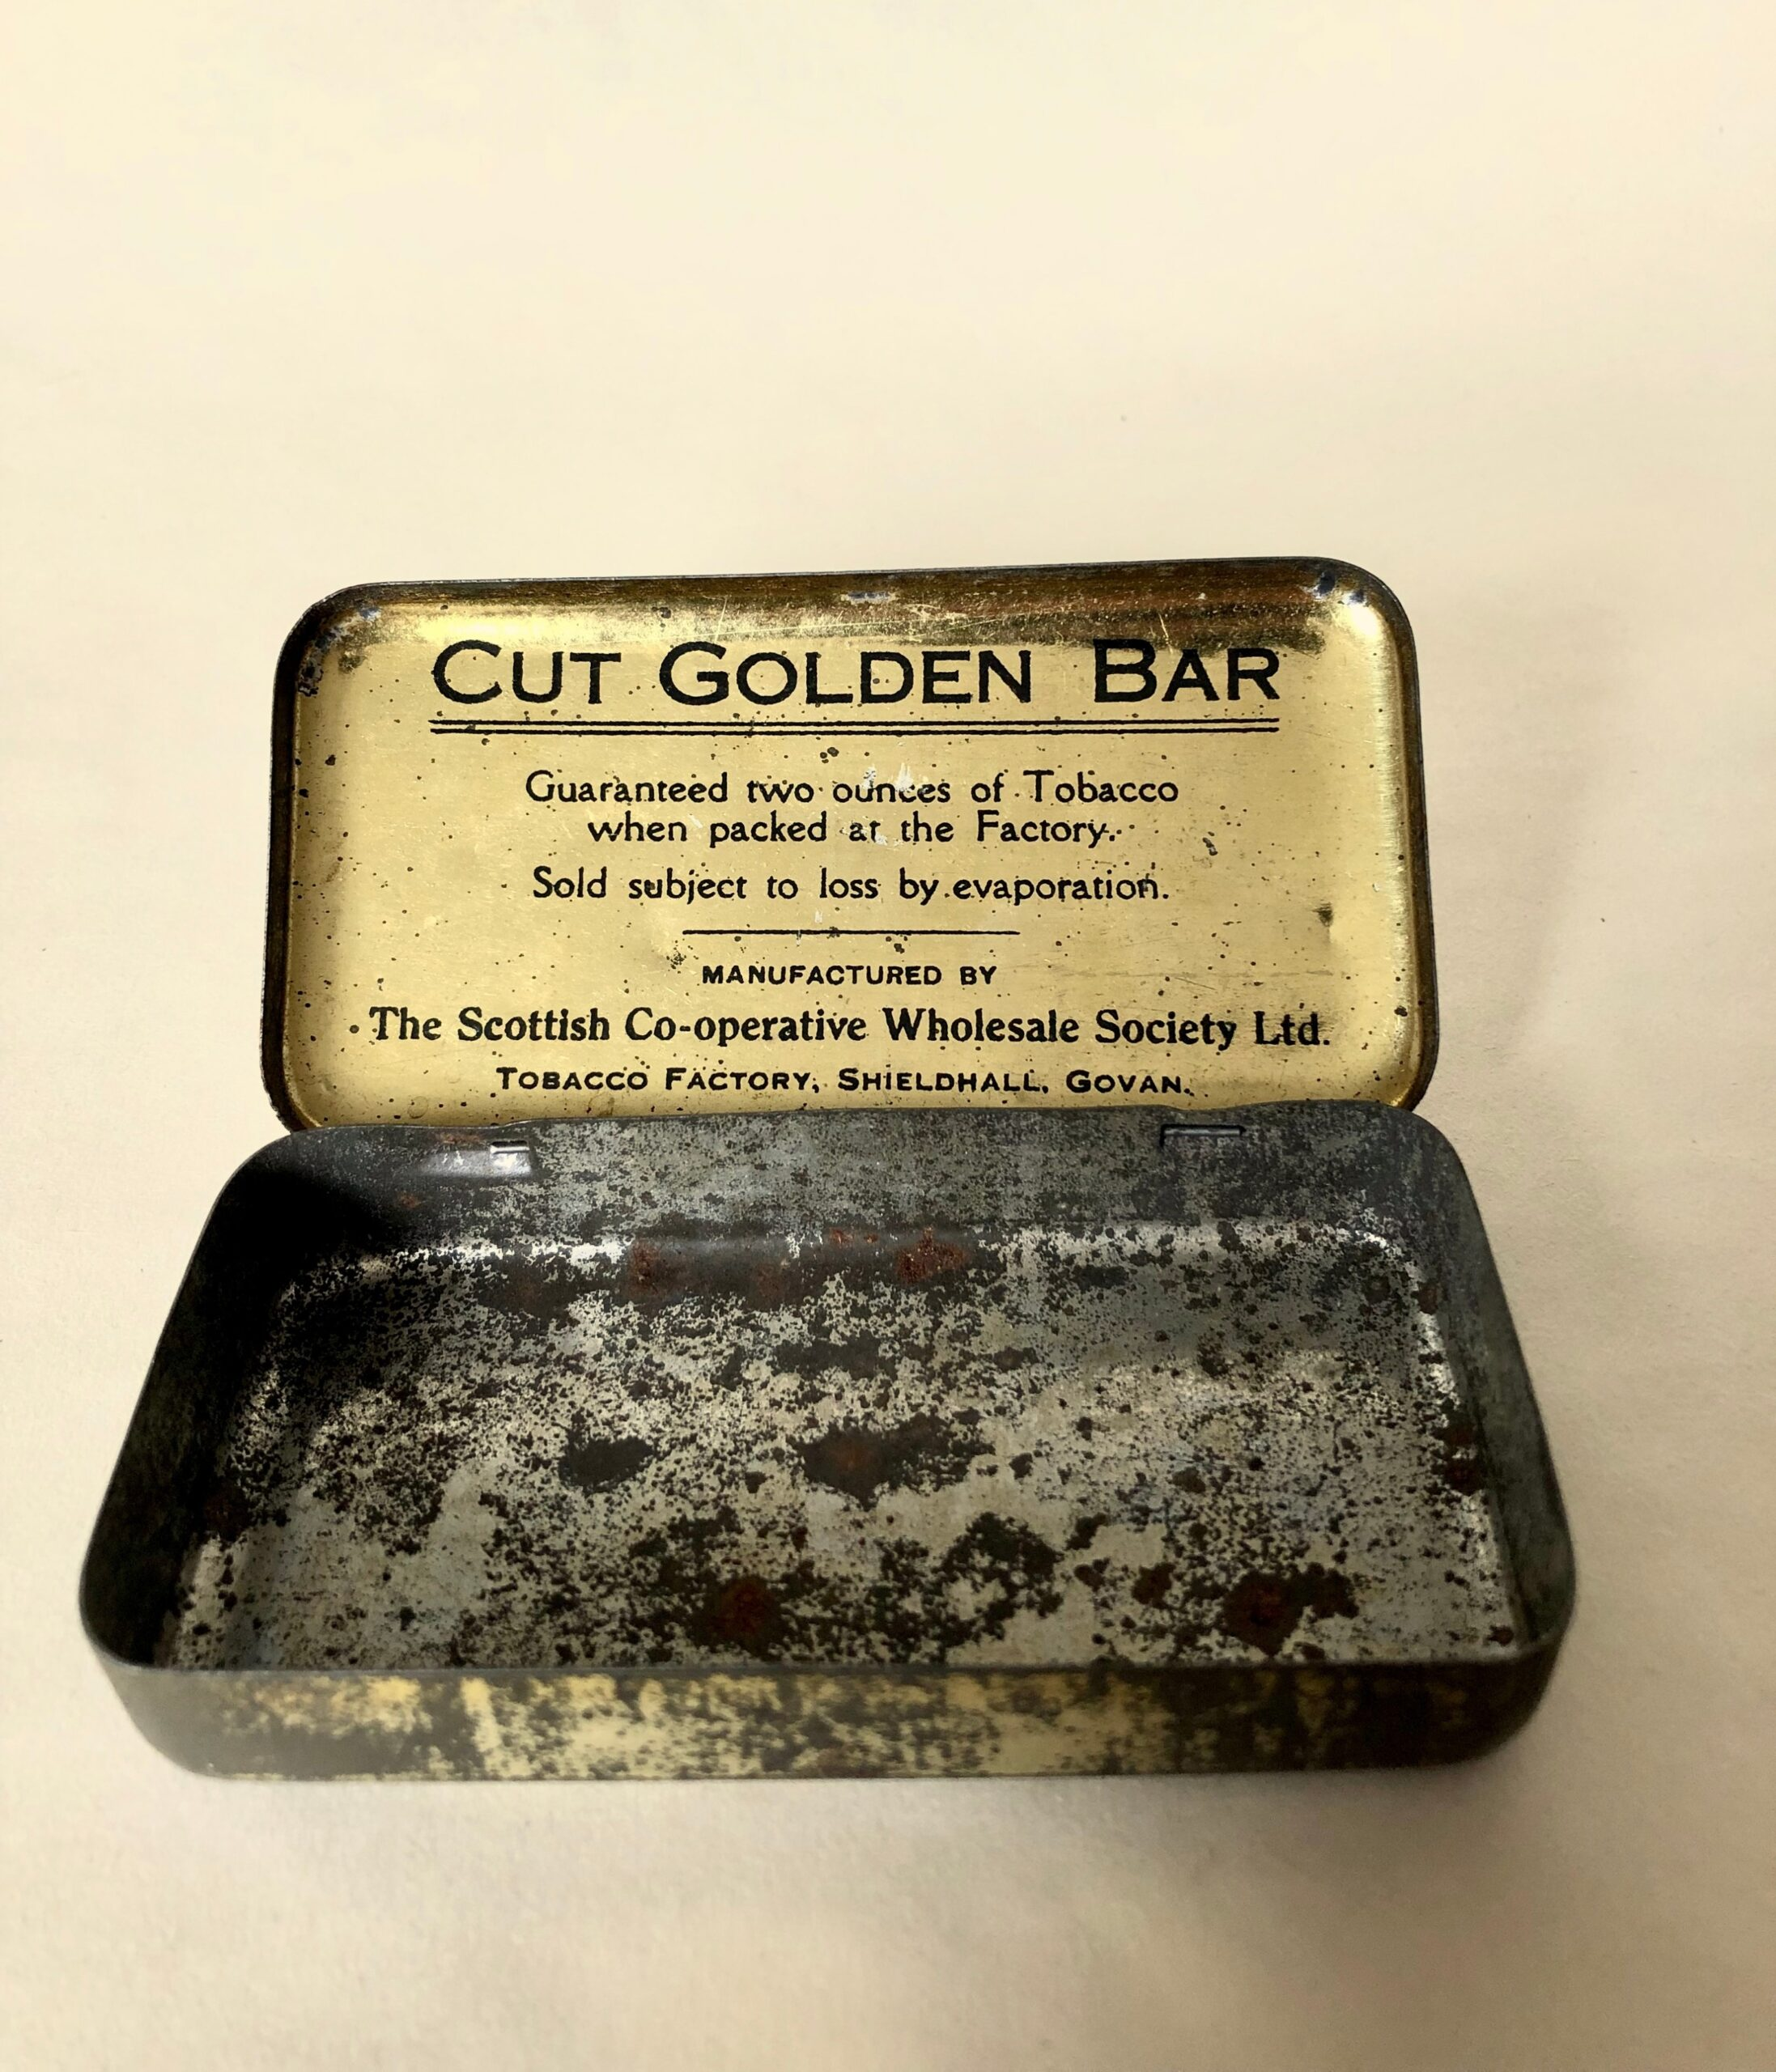 Shieldhall Golf Tobacco Tin